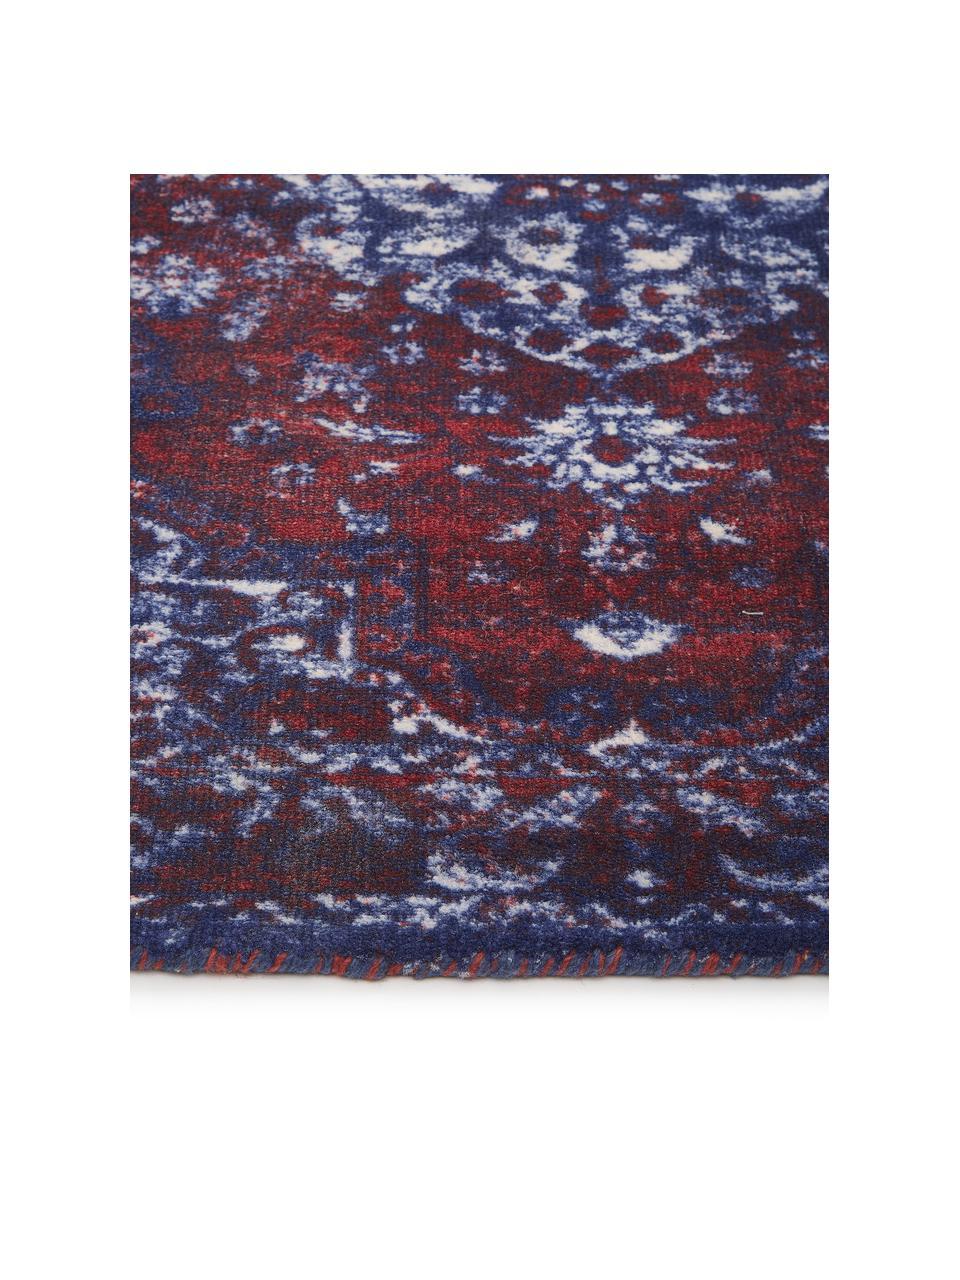 Teppich Elegant im Vintage Style, Flor: 100% Nylon, Rot, Blau, B 120 x L 180 cm (Größe S)